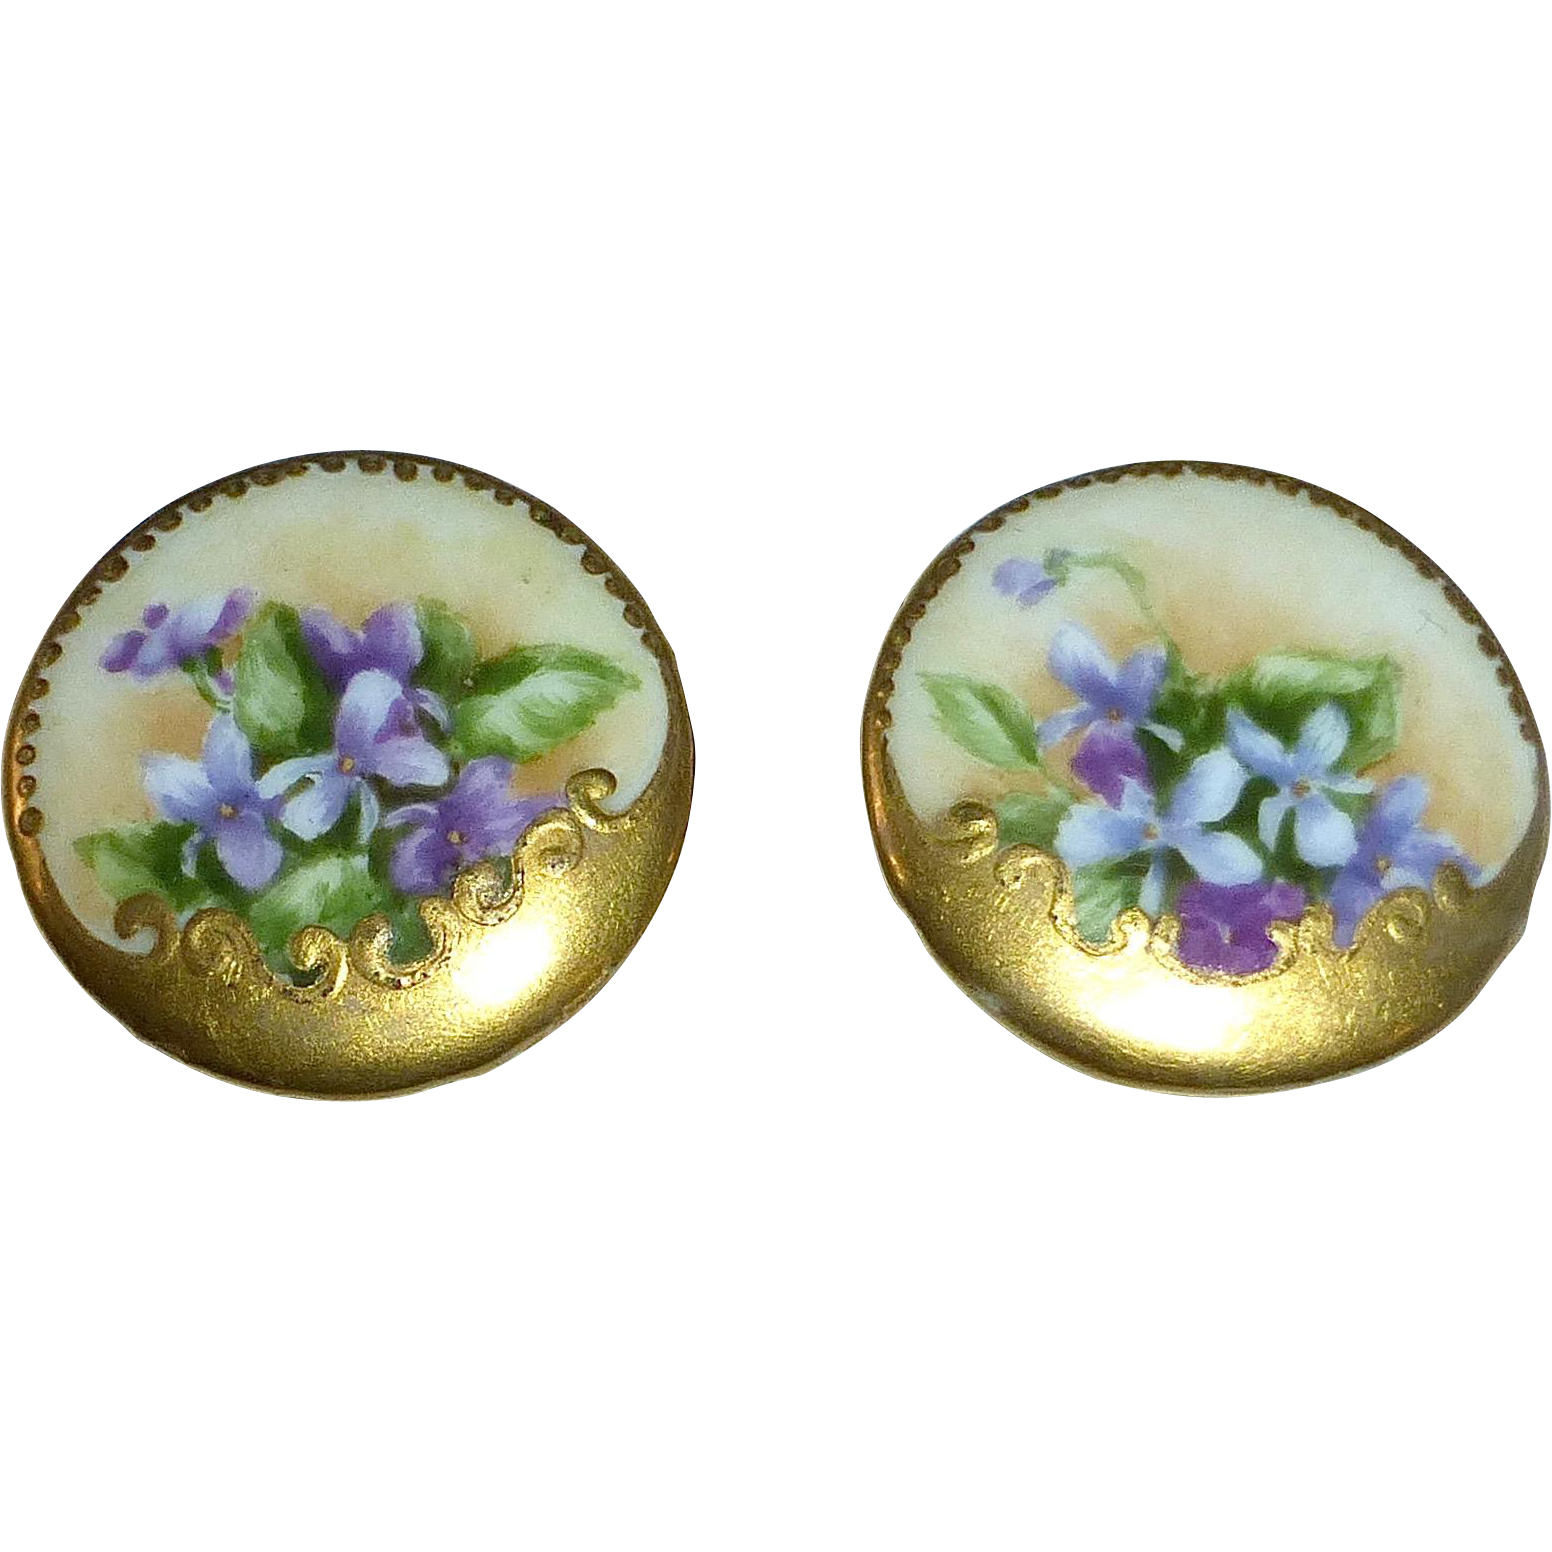 Victorian Hand Painted Porcelain Violets Cufflinks